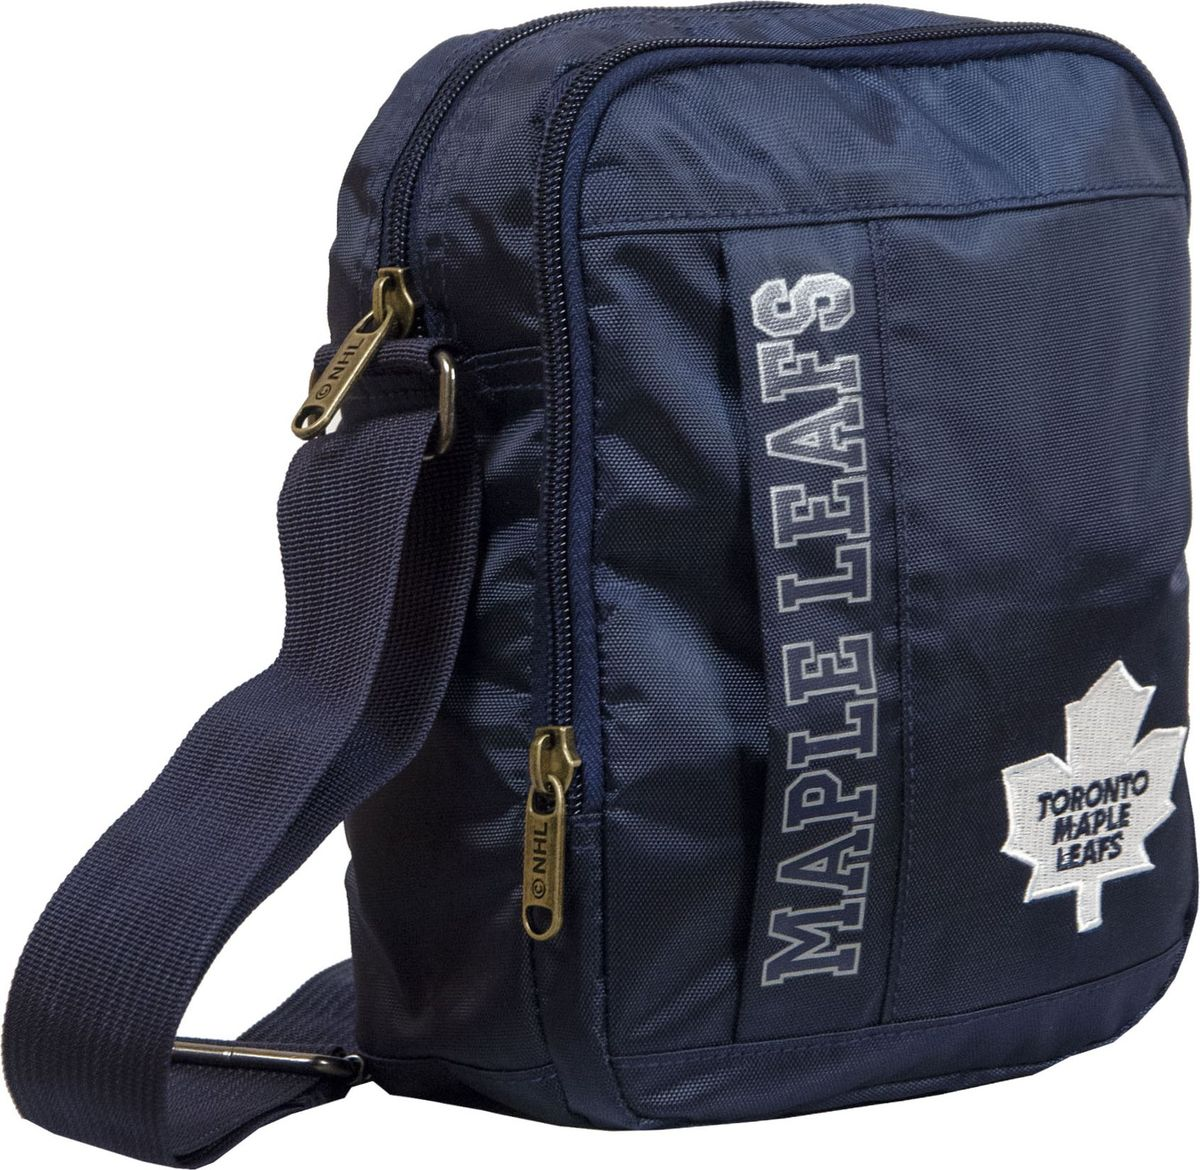 Сумка на плечо Atributika & Club Toronto Maple Leafs, цвет: синий, 15 л. 58030 сумка atributika & club™ atributika & club™ at006buhlm36